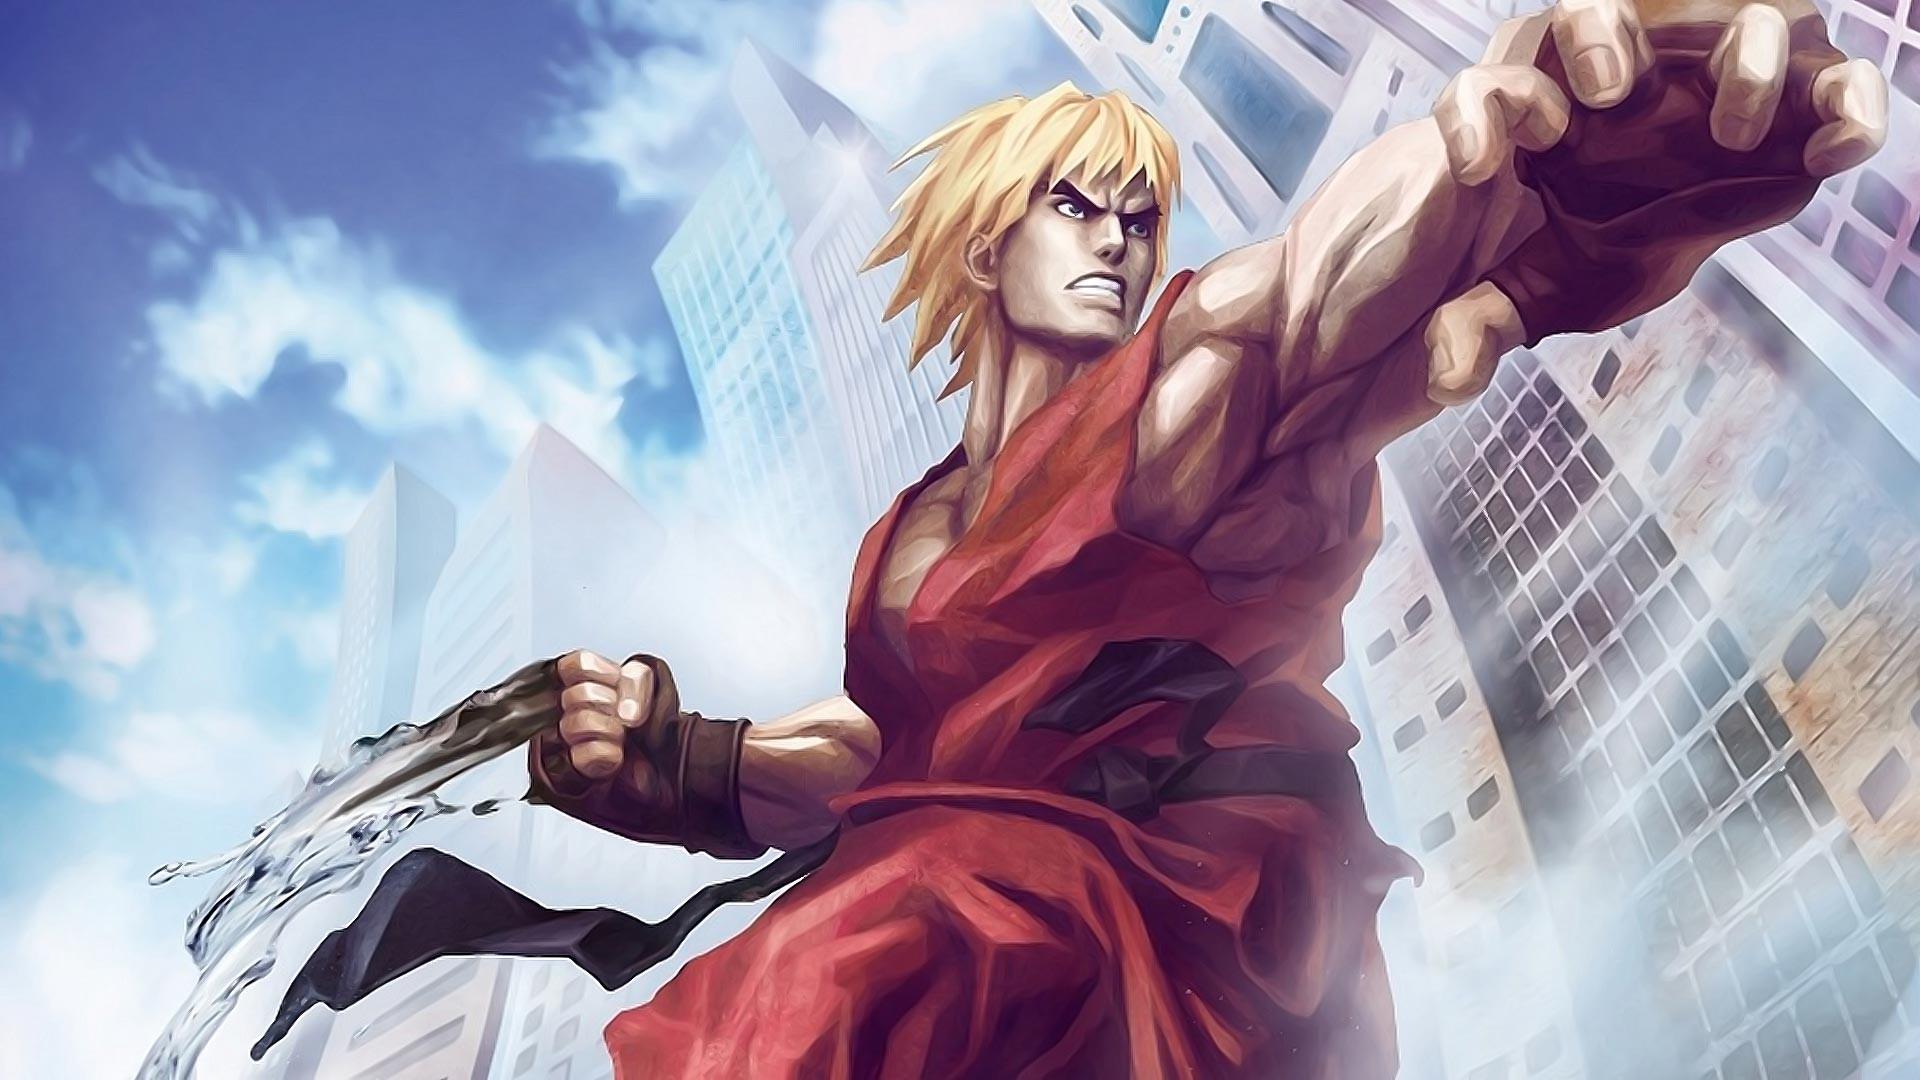 50 Street Fighter X Tekken HD Wallpapers